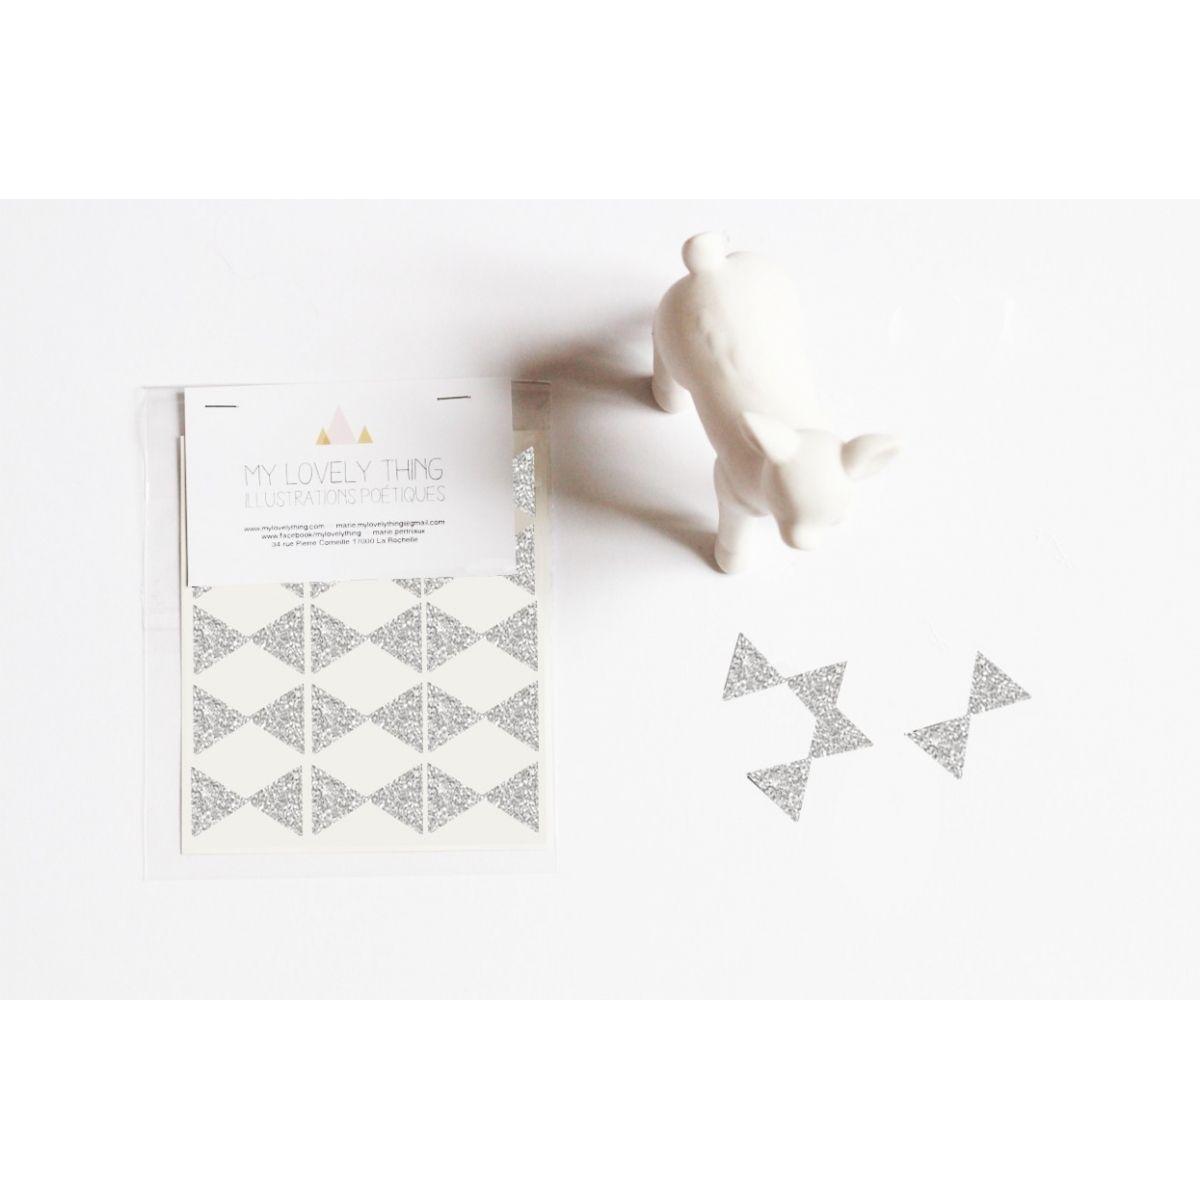 Naklejki Stickers Bow Tie silver kokardka srebrna - My Lovely